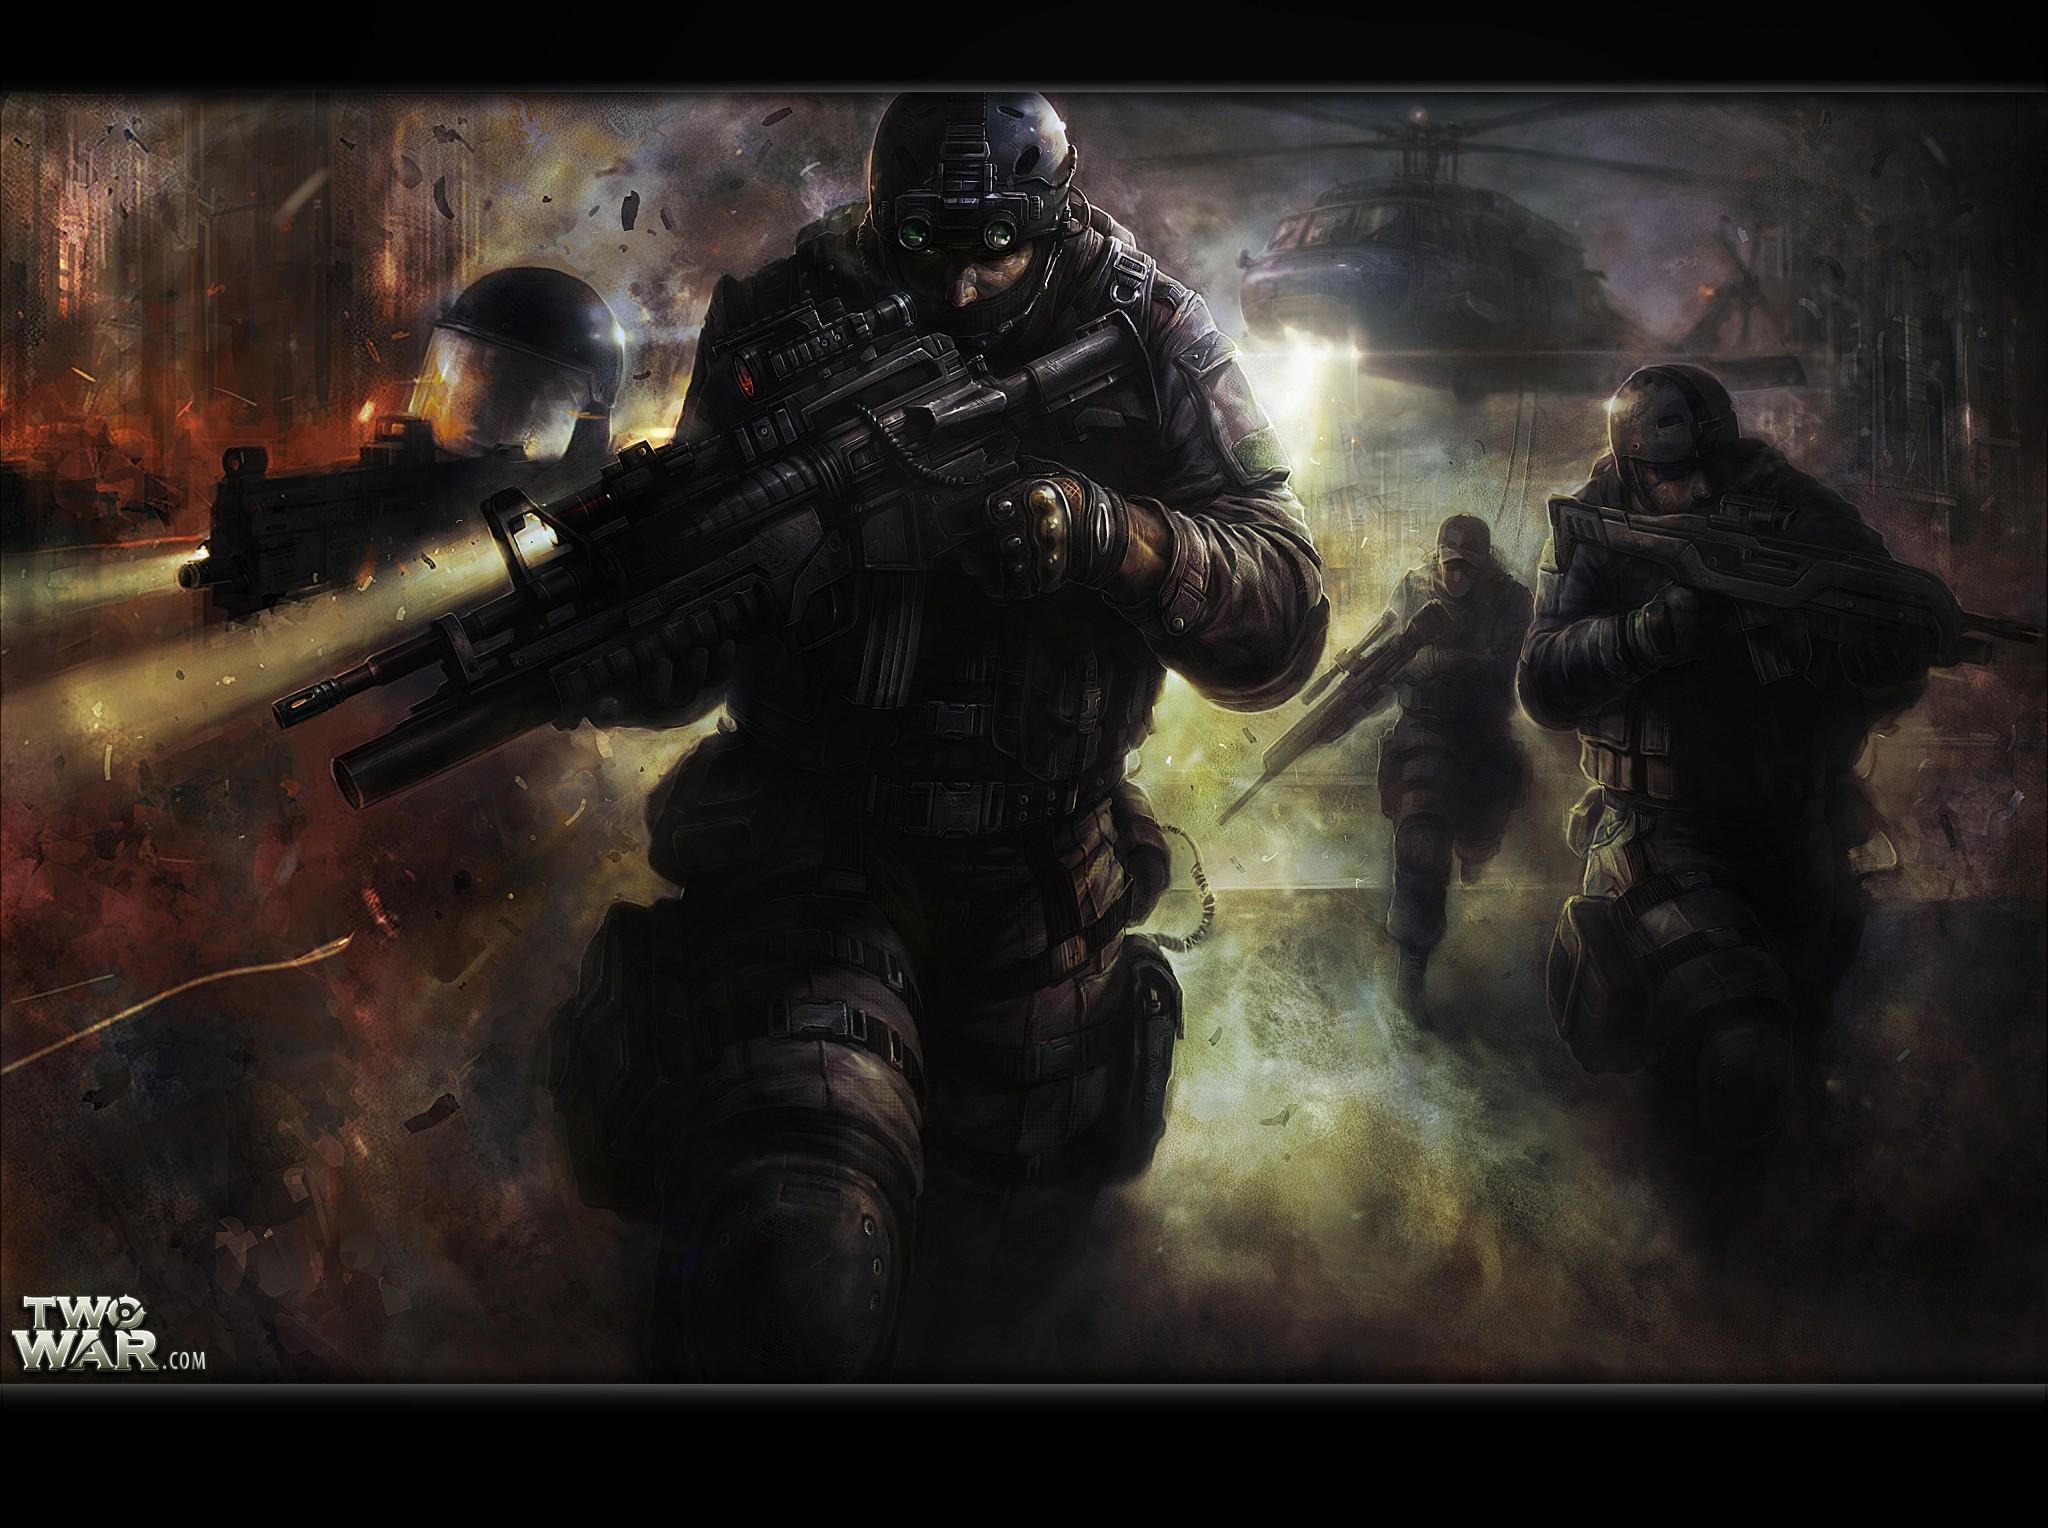 BlackShot - Armi e personaggi